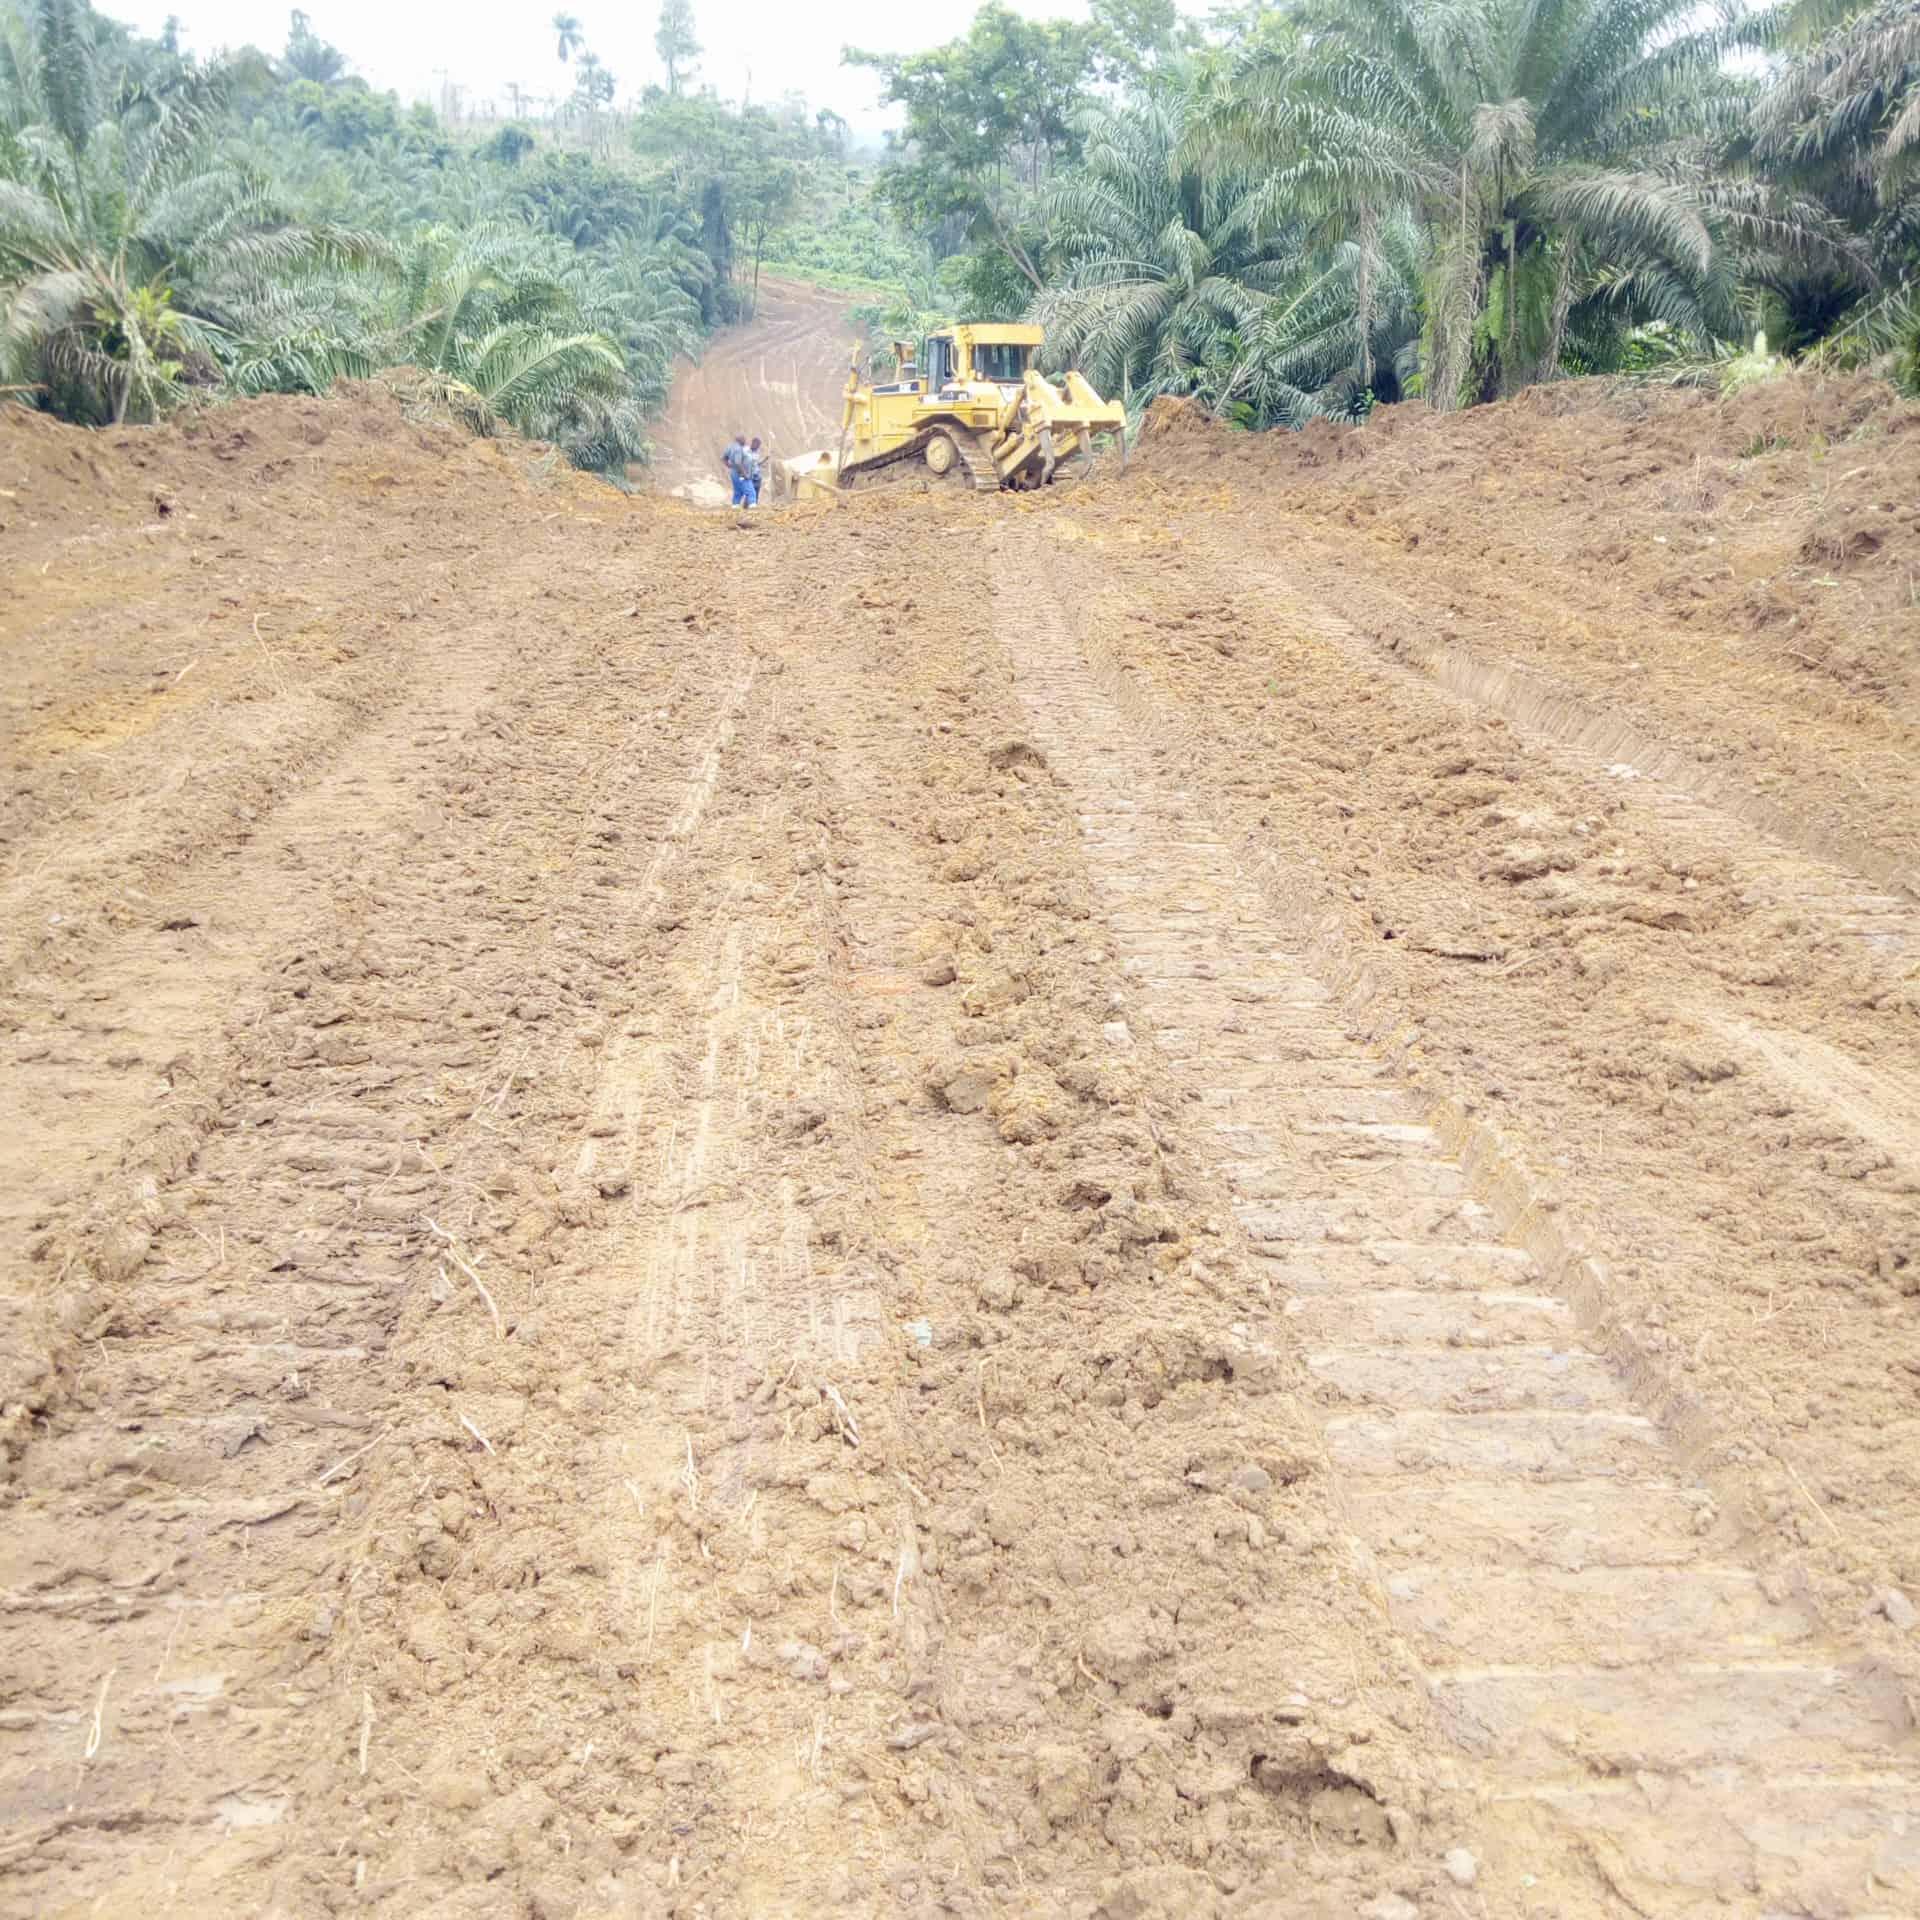 Land for sale at Douala, Lendi, Limite Gombe - 40000000 m2 - 50 000 000 FCFA